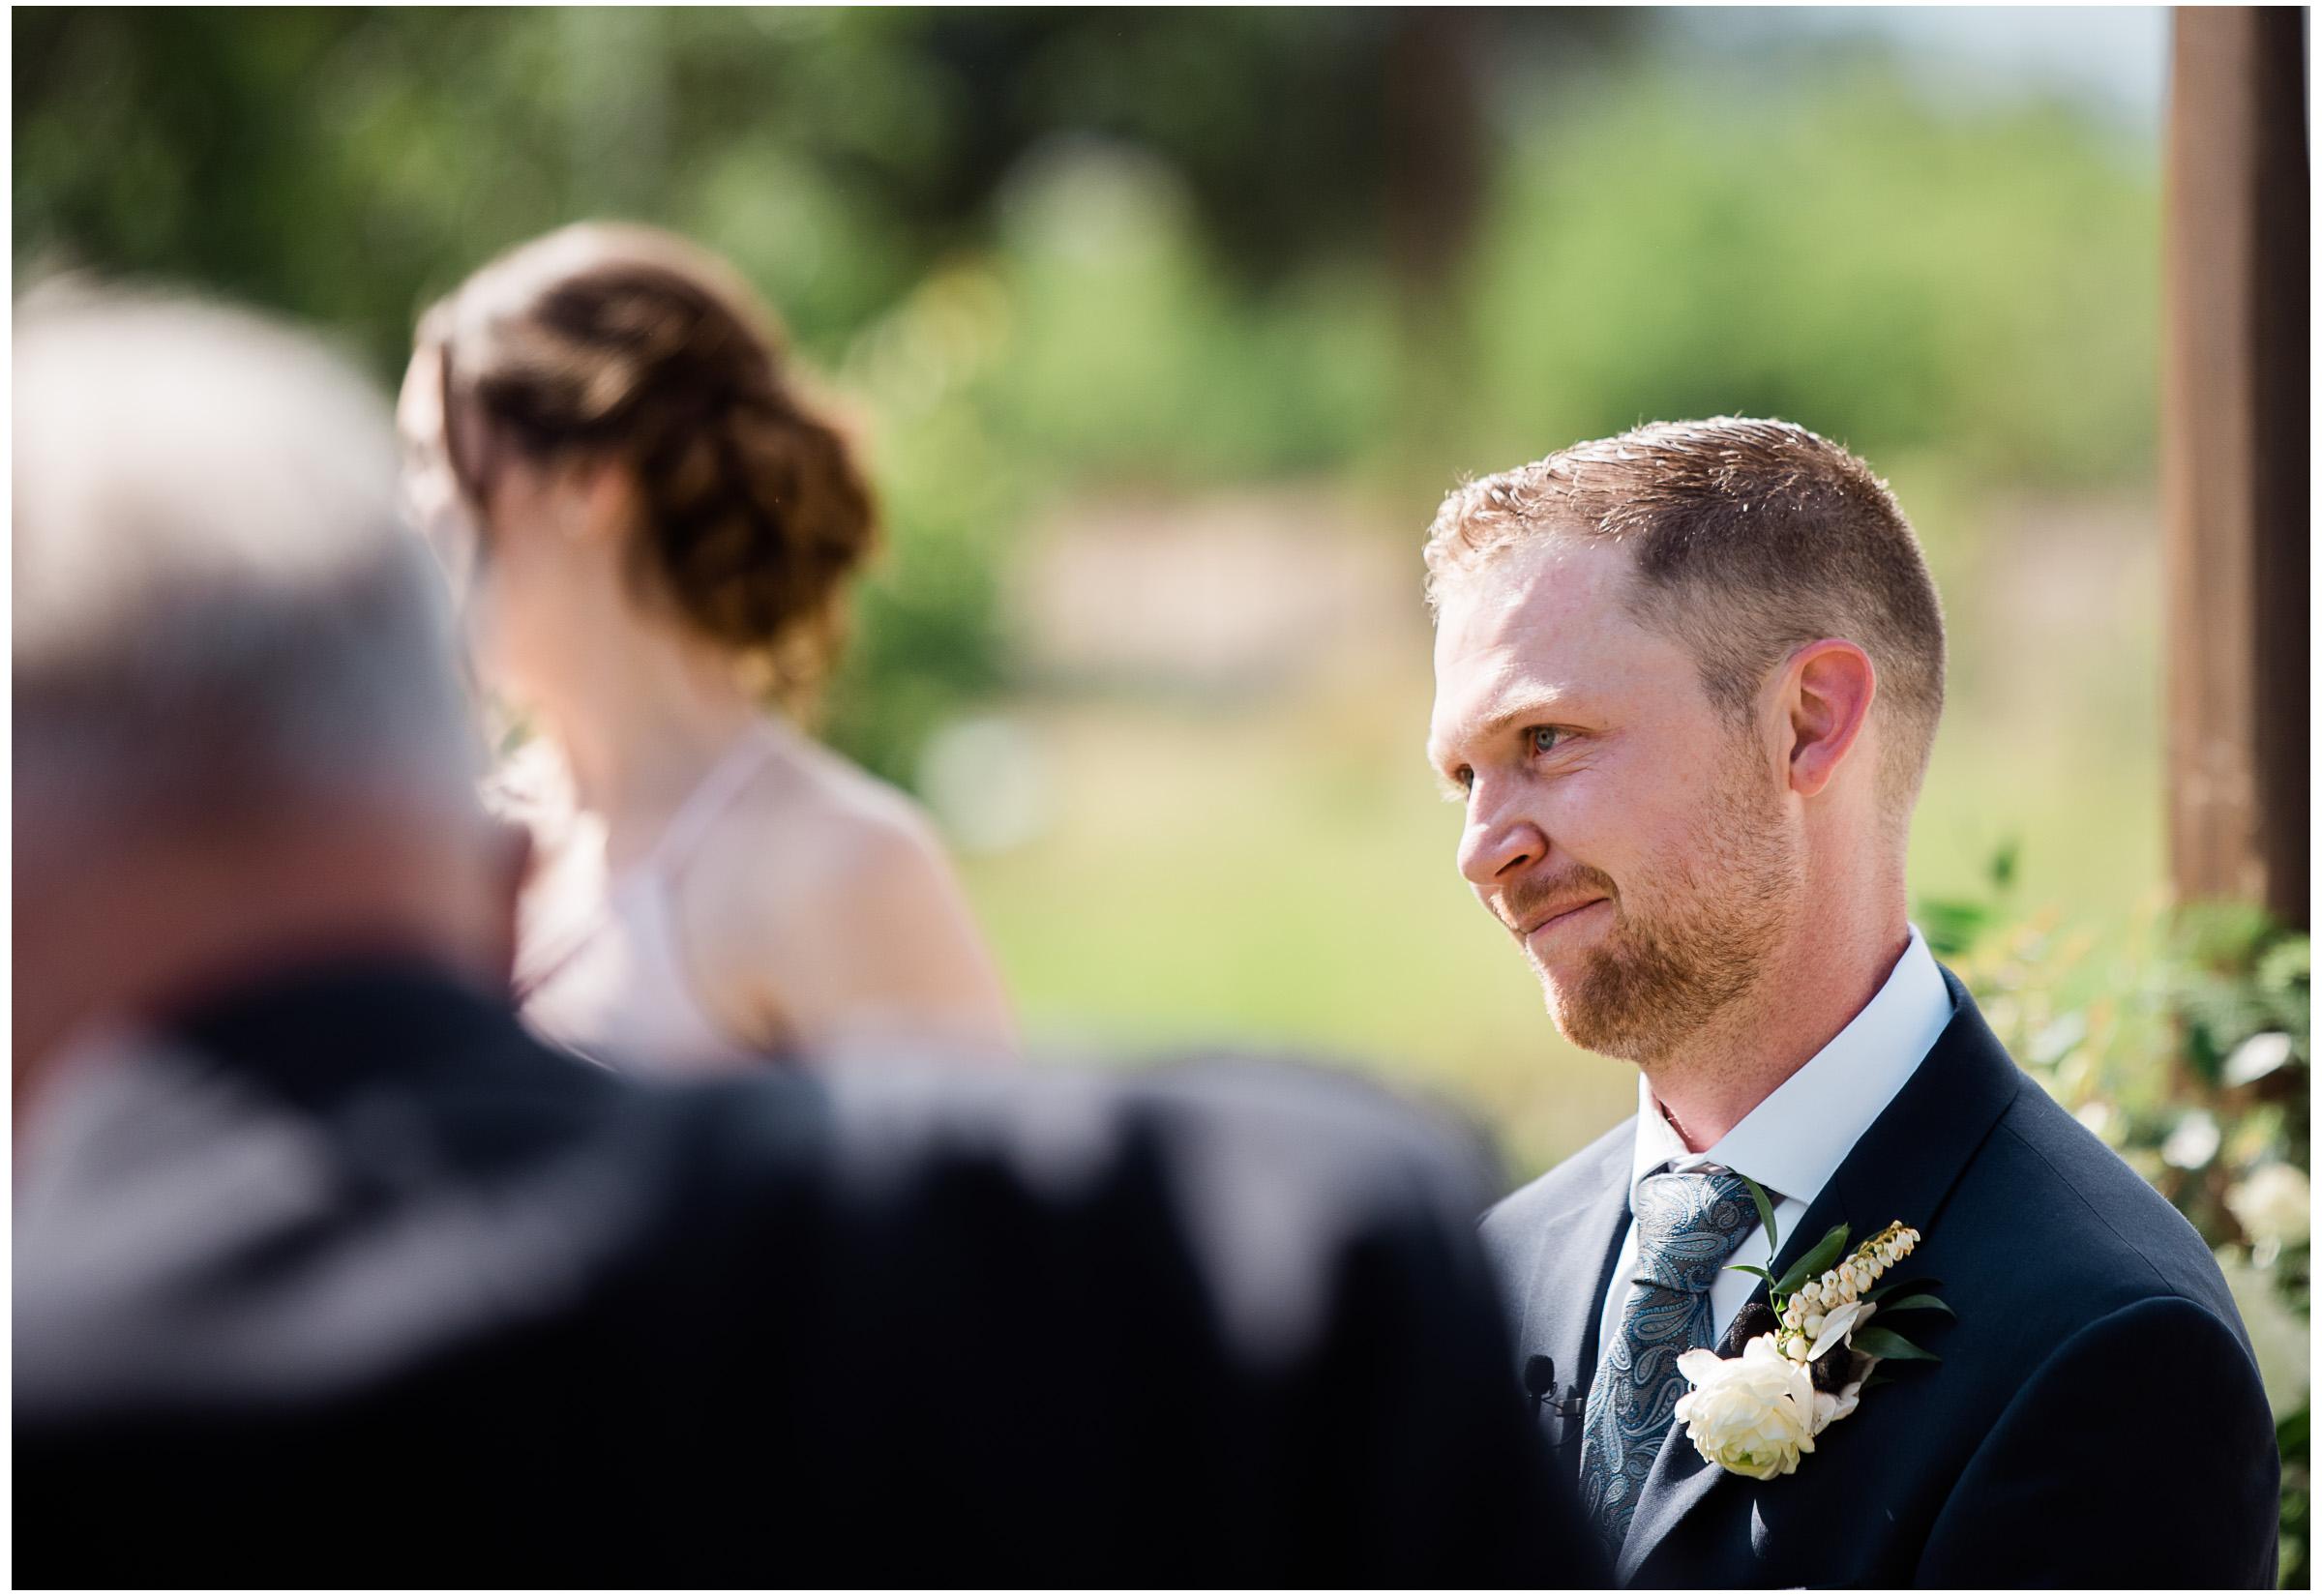 Winters Wedding - Sacramento Photographer - Field & Pond - Justin Wilcox Photography - 26.jpg